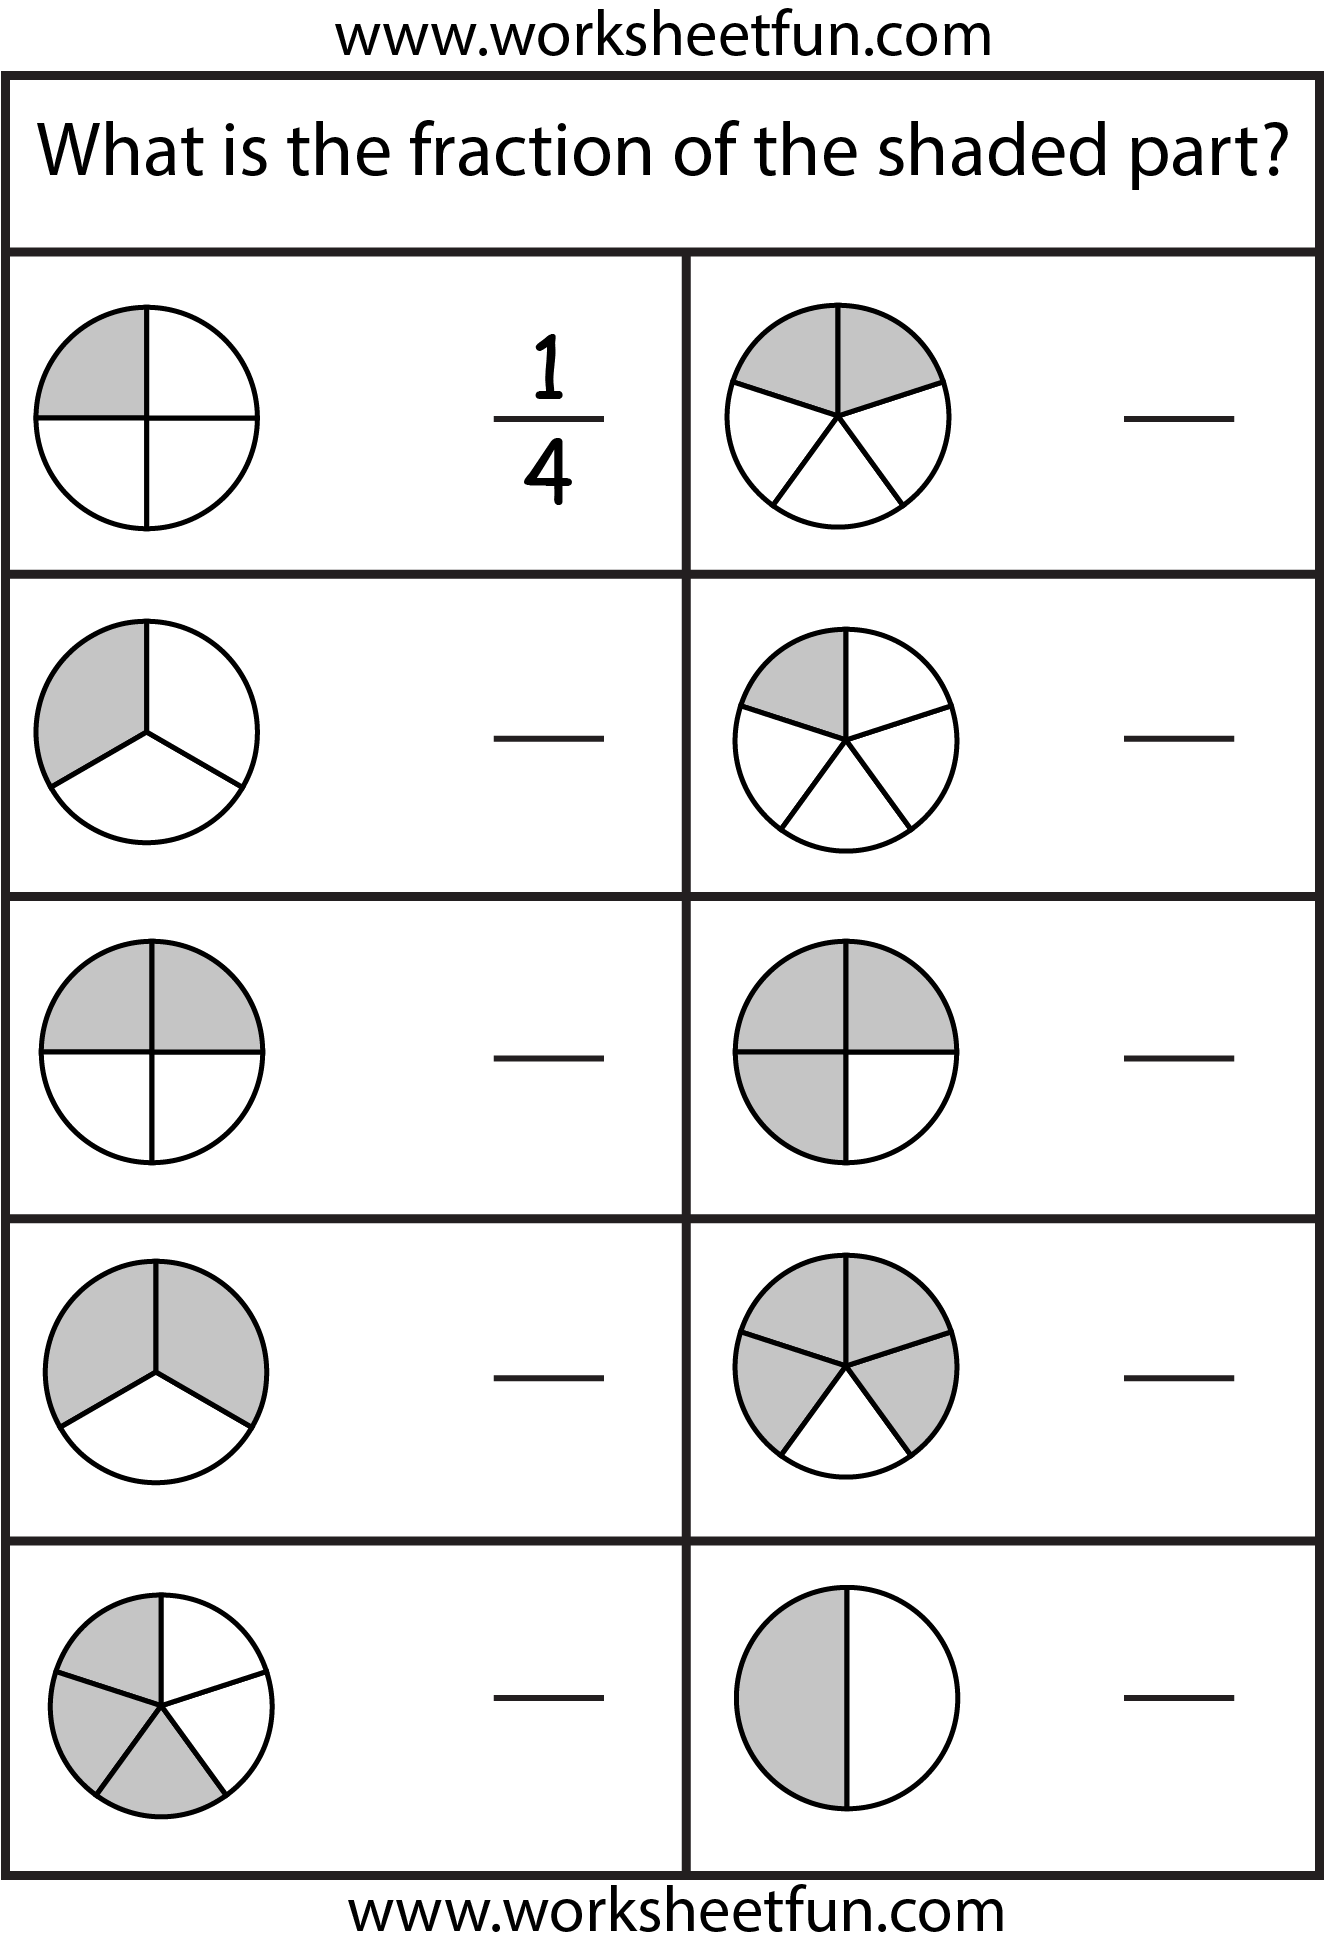 hight resolution of Free Fraction Worksheets   Math fractions worksheets